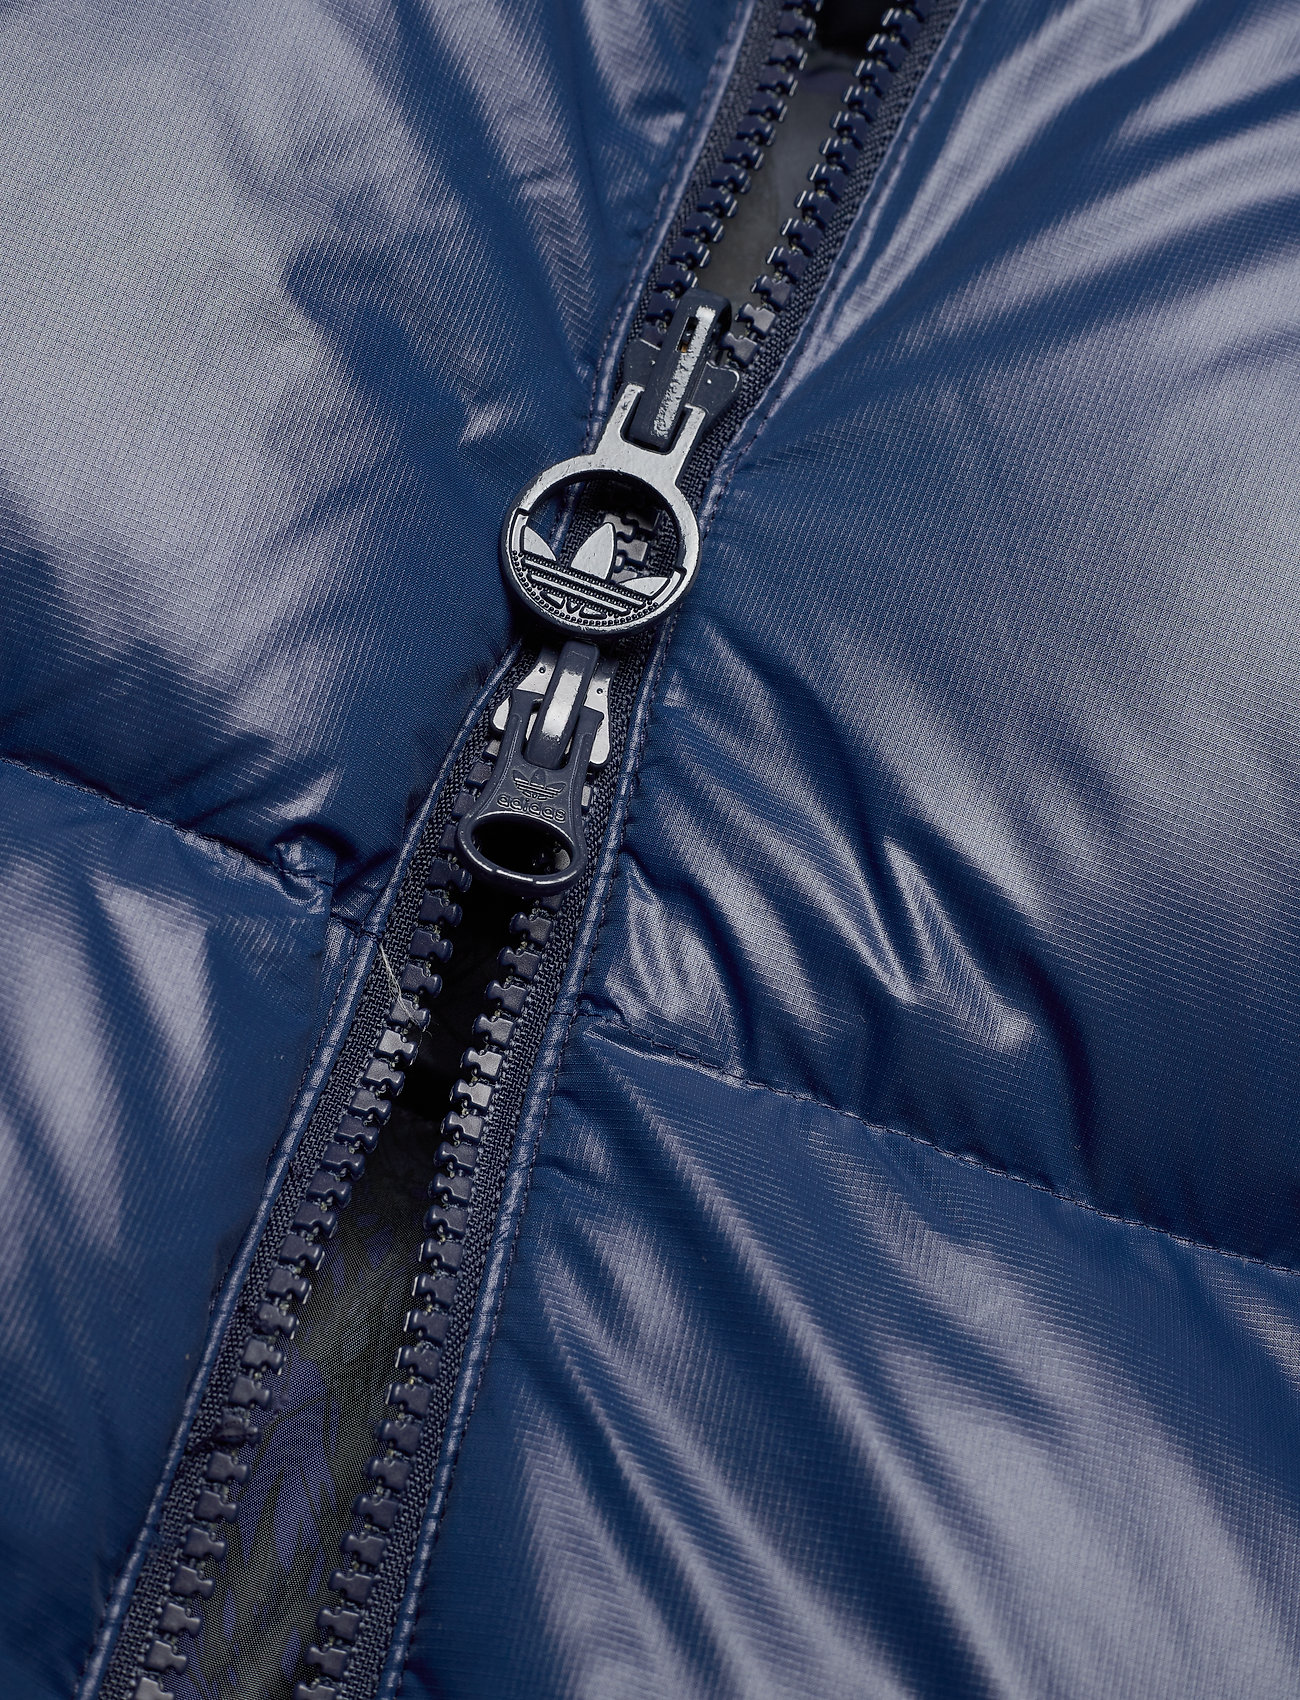 adidas Originals DOWN REGEN CAMO - Jakker og frakker MULTCO - Menn Klær